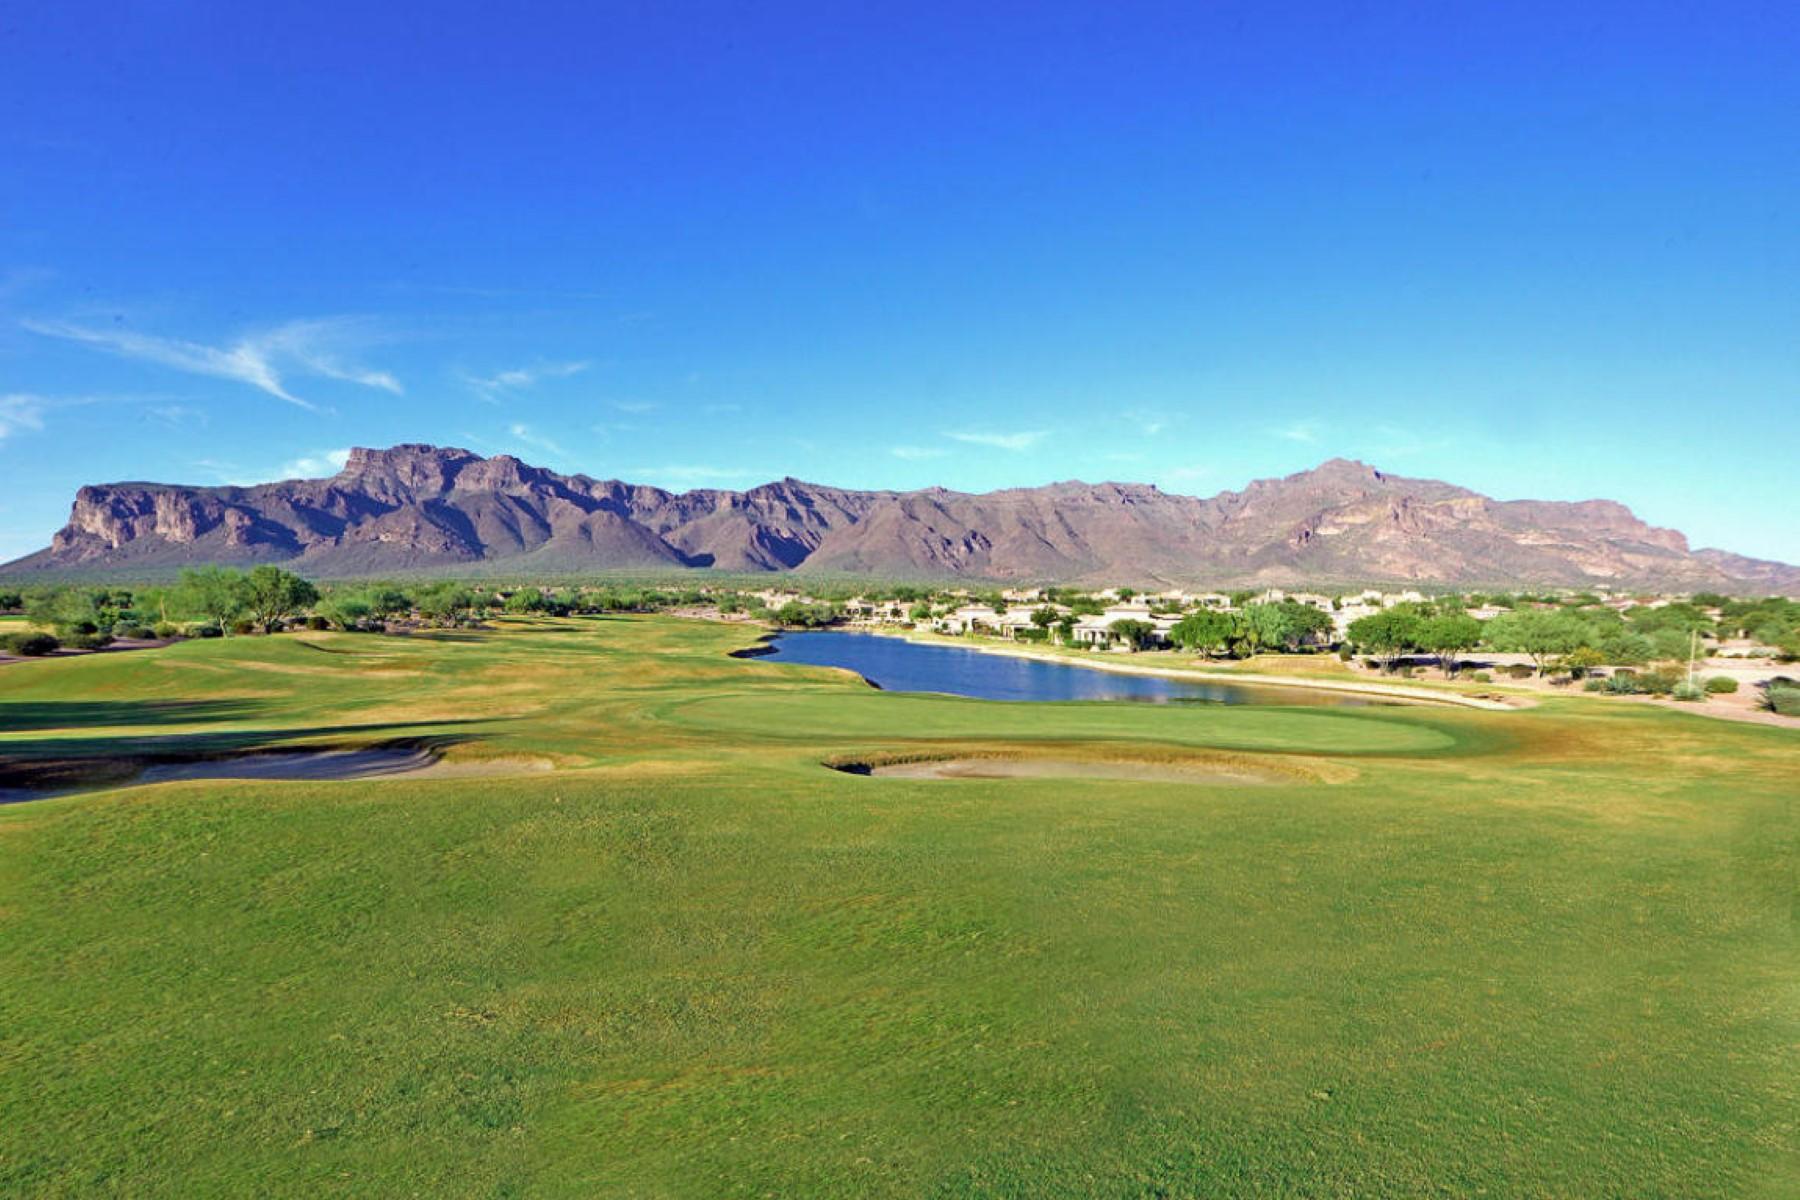 Terreno para Venda às Build-ready level lot with big views of the Superstitions 3605 S Ponderosa DR #18 Gold Canyon, Arizona 85118 Estados Unidos